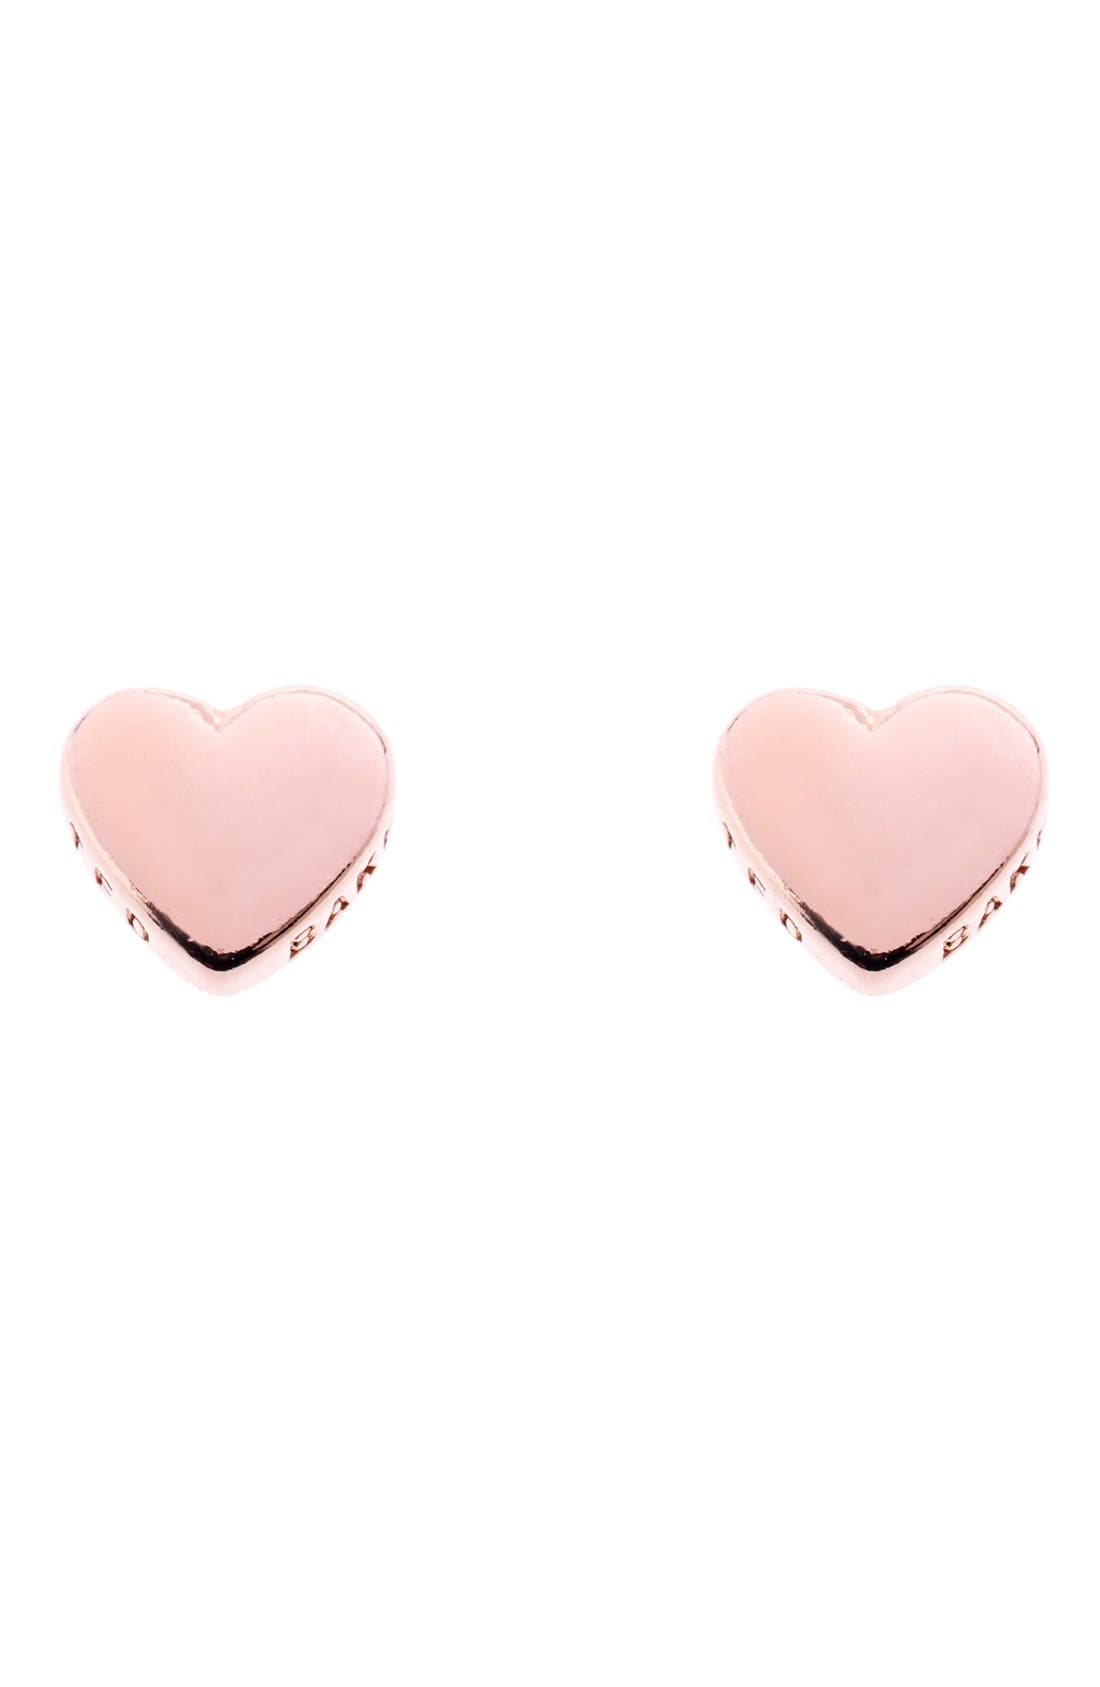 Main Image - Ted Baker London 'Tiny Heart' Stud Earrings